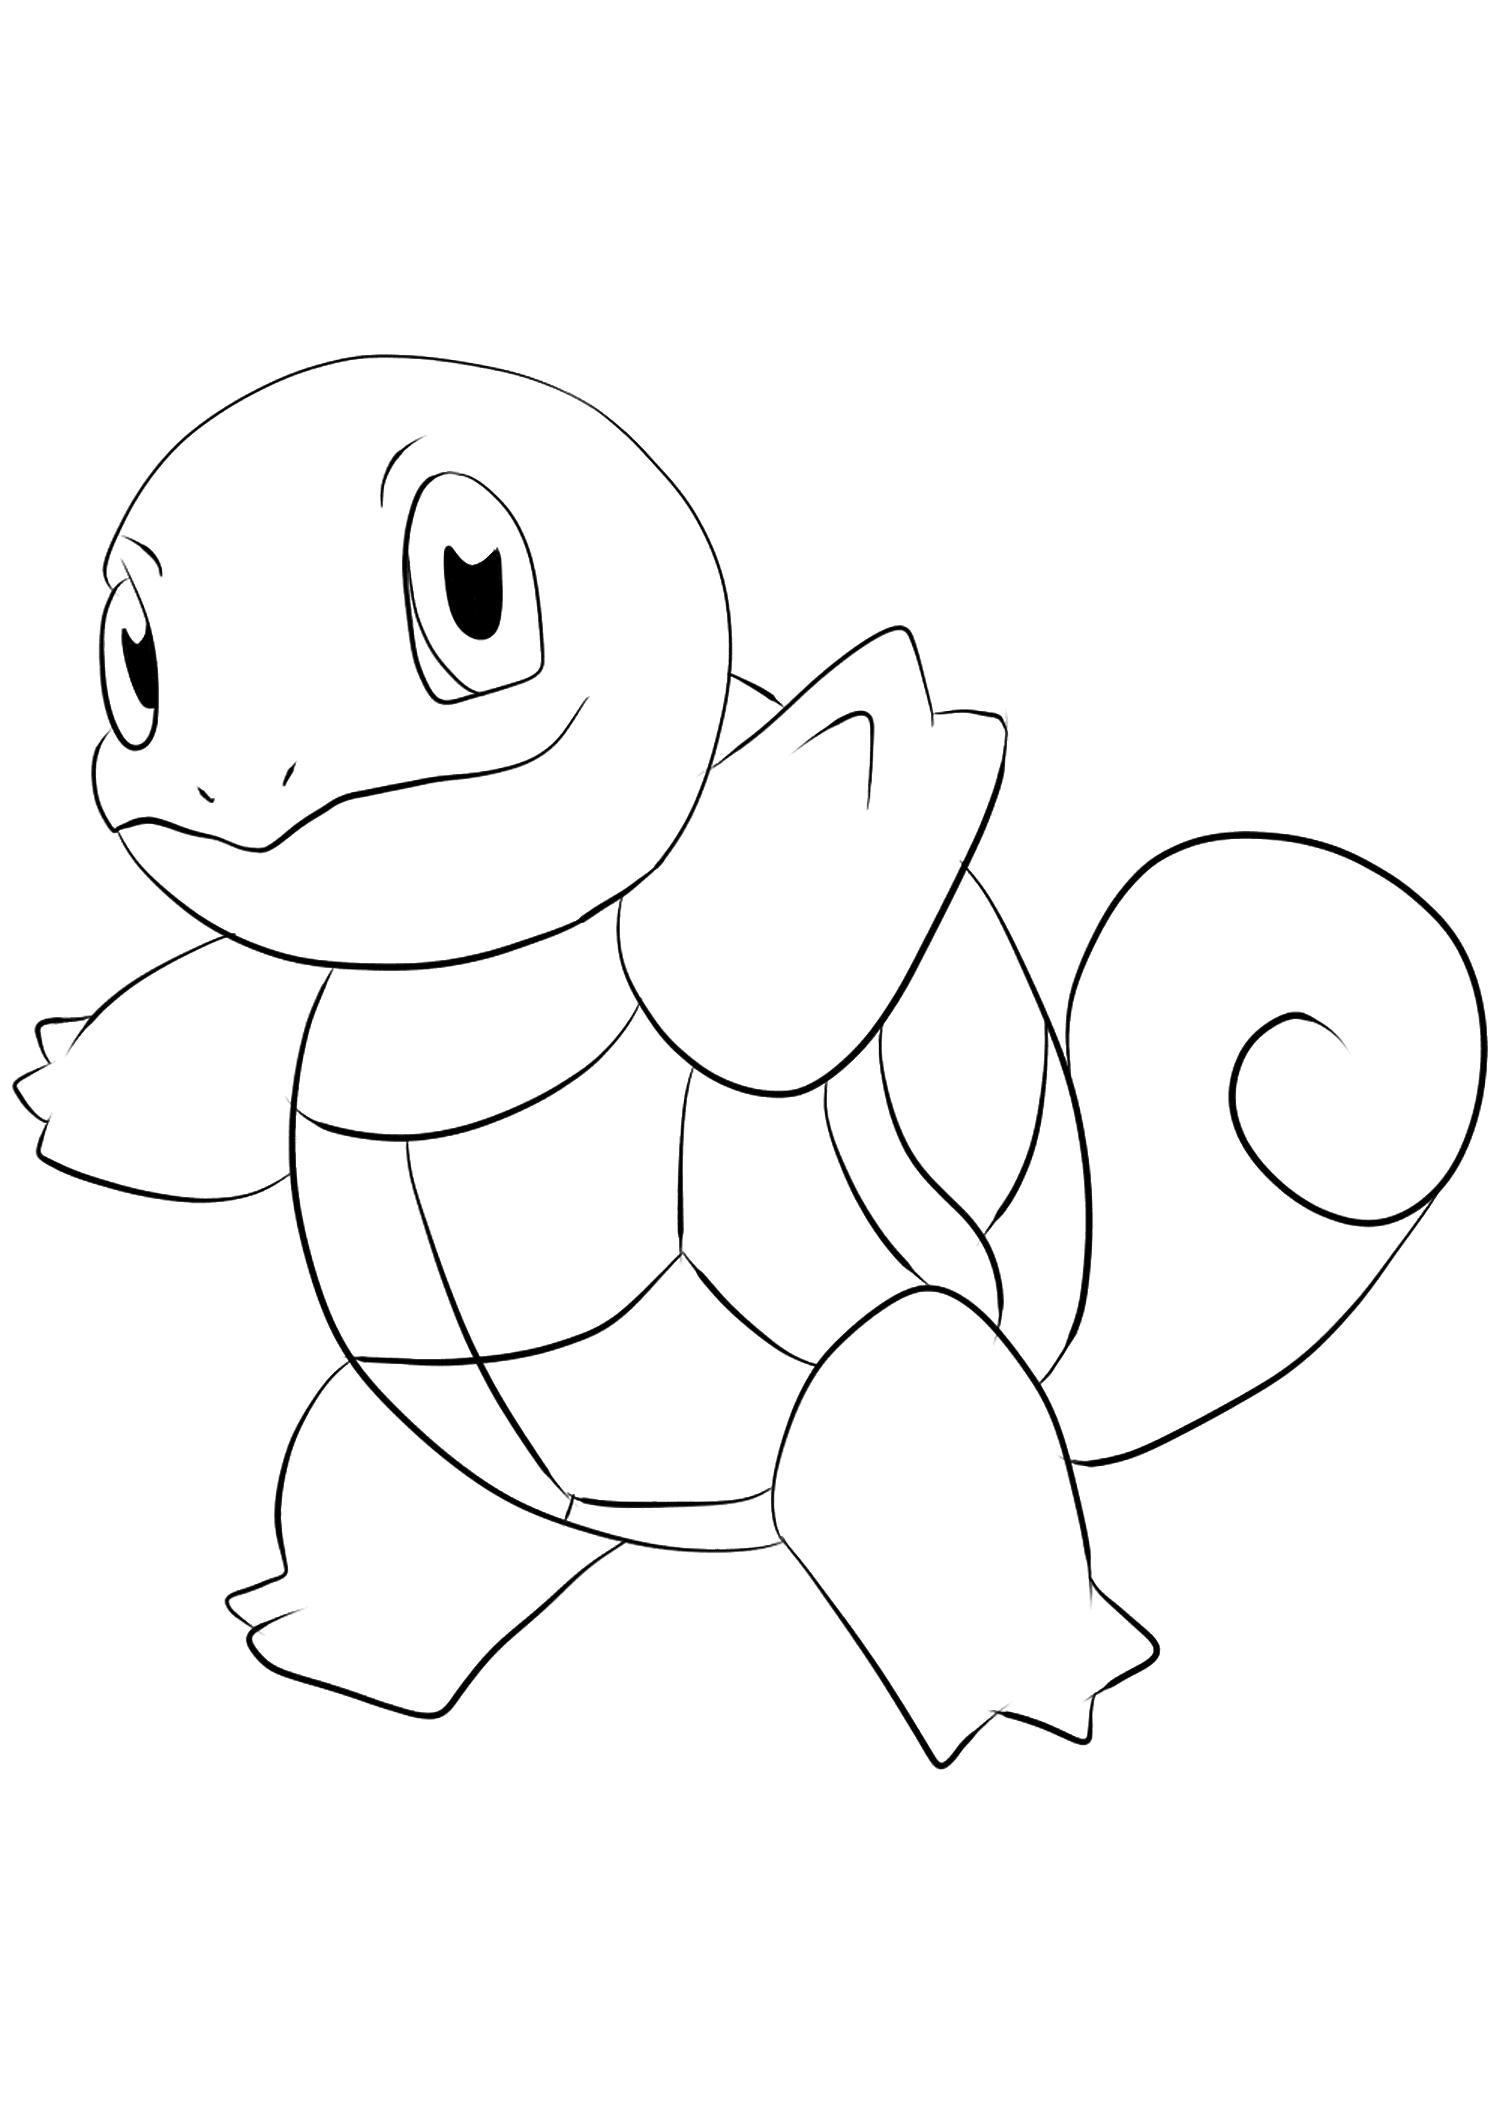 Squirtle No.07 : Pokemon Generation I - All Pokemon ...